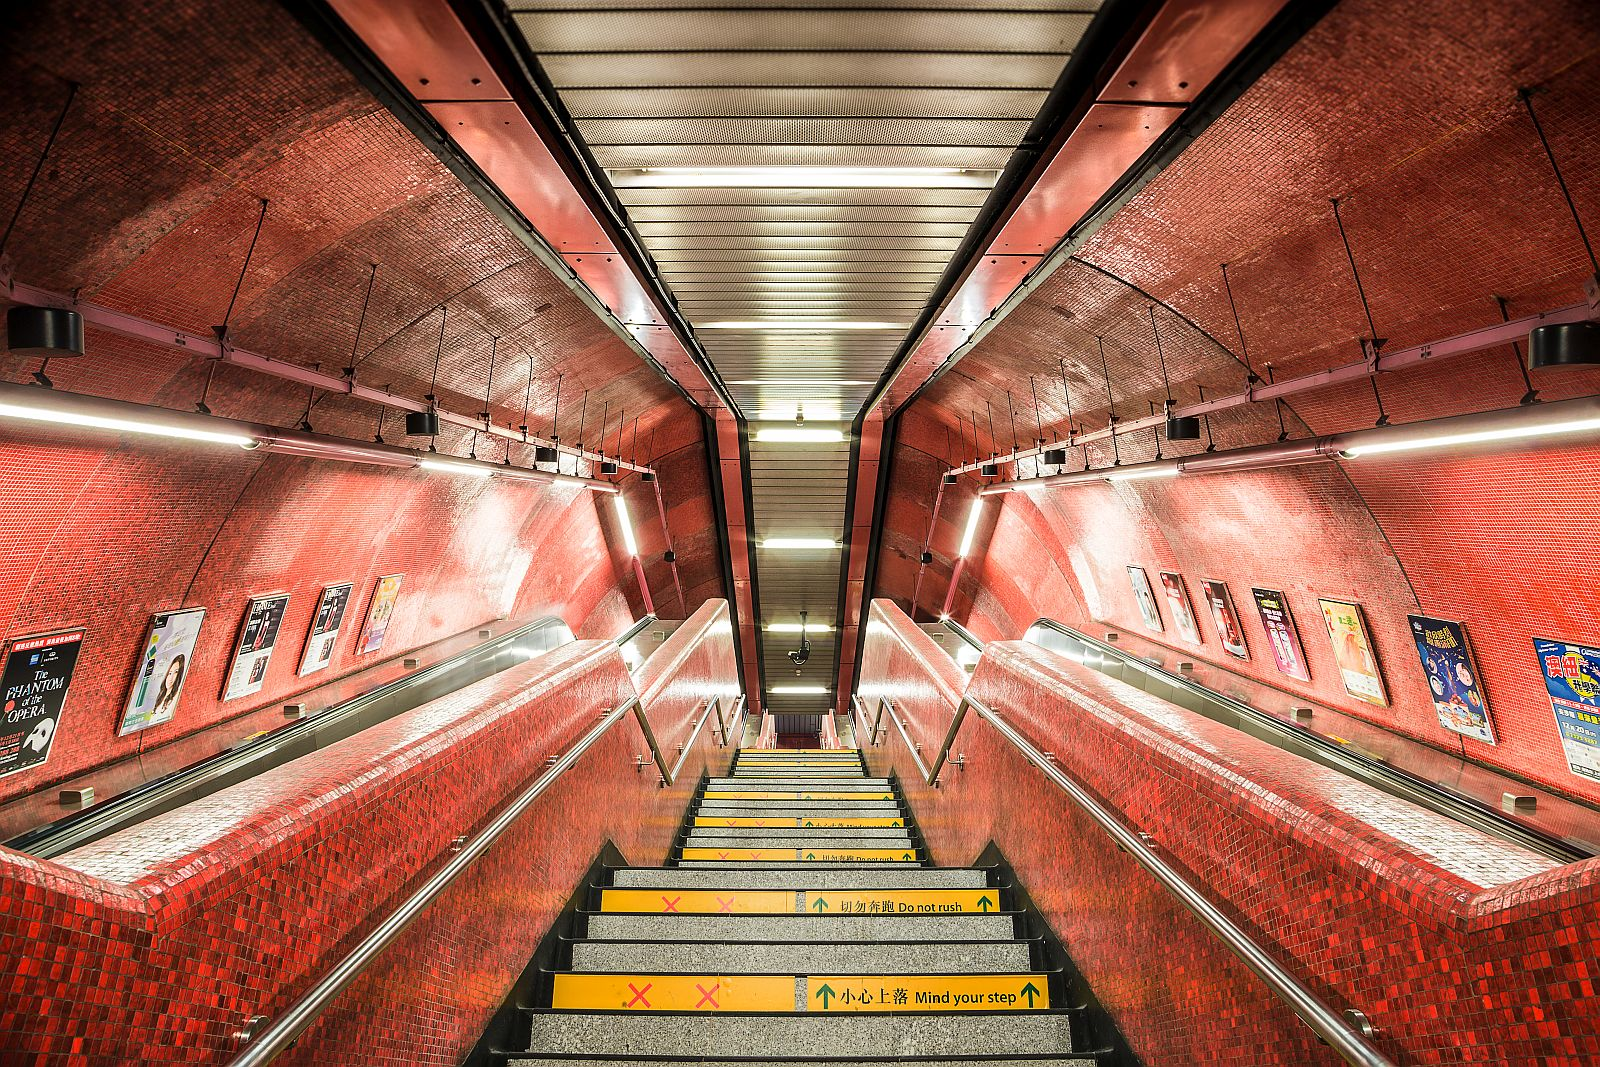 «Заміська симетрія». Перше місце в номінації «Architecture Other». Фото: Thorben Kremers